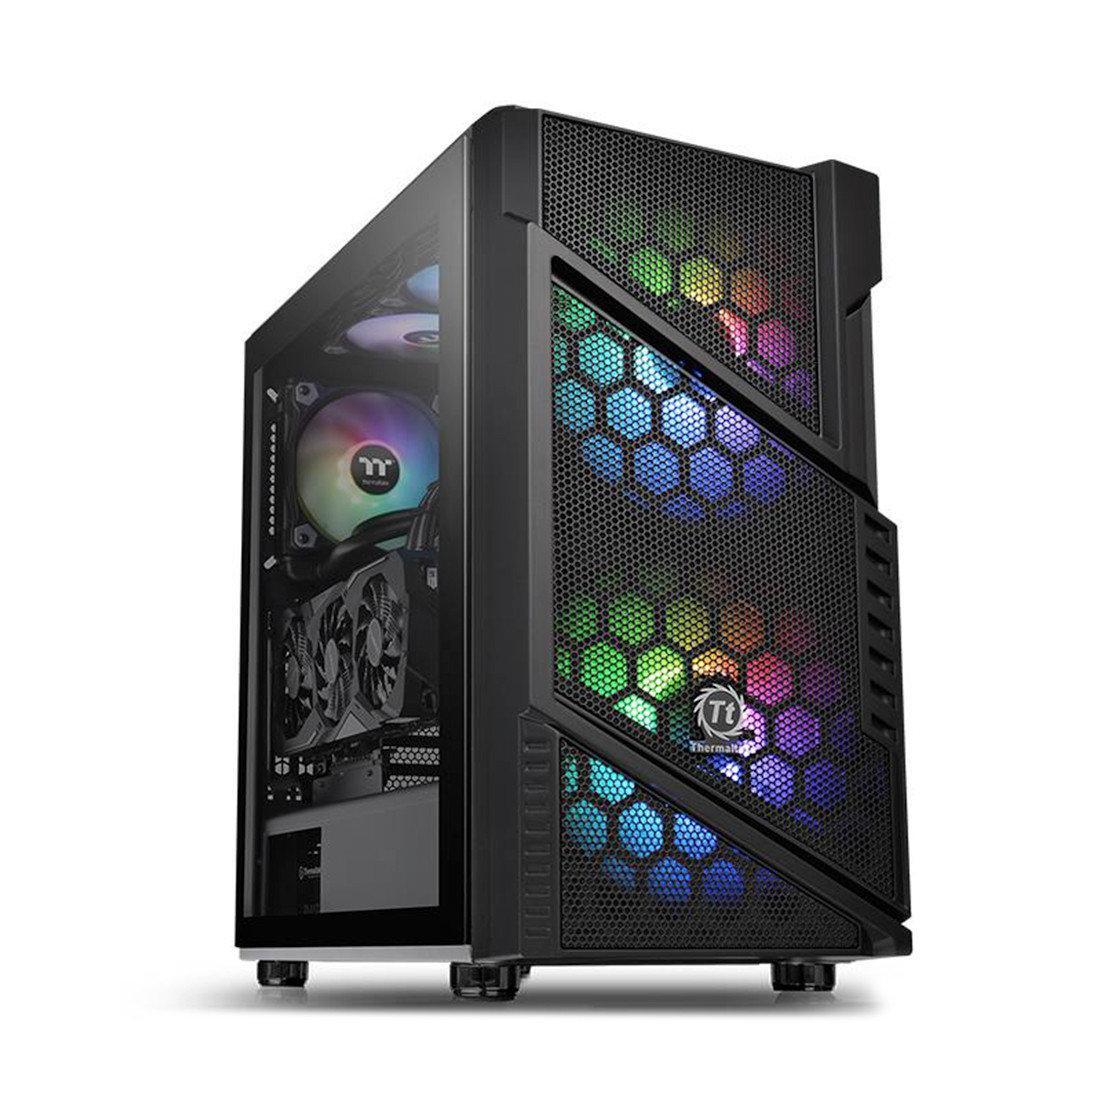 Системный блок Intel Core i5-8400 2.8GHZ/H310/DDR4 4GB/SSD 120GB/450W